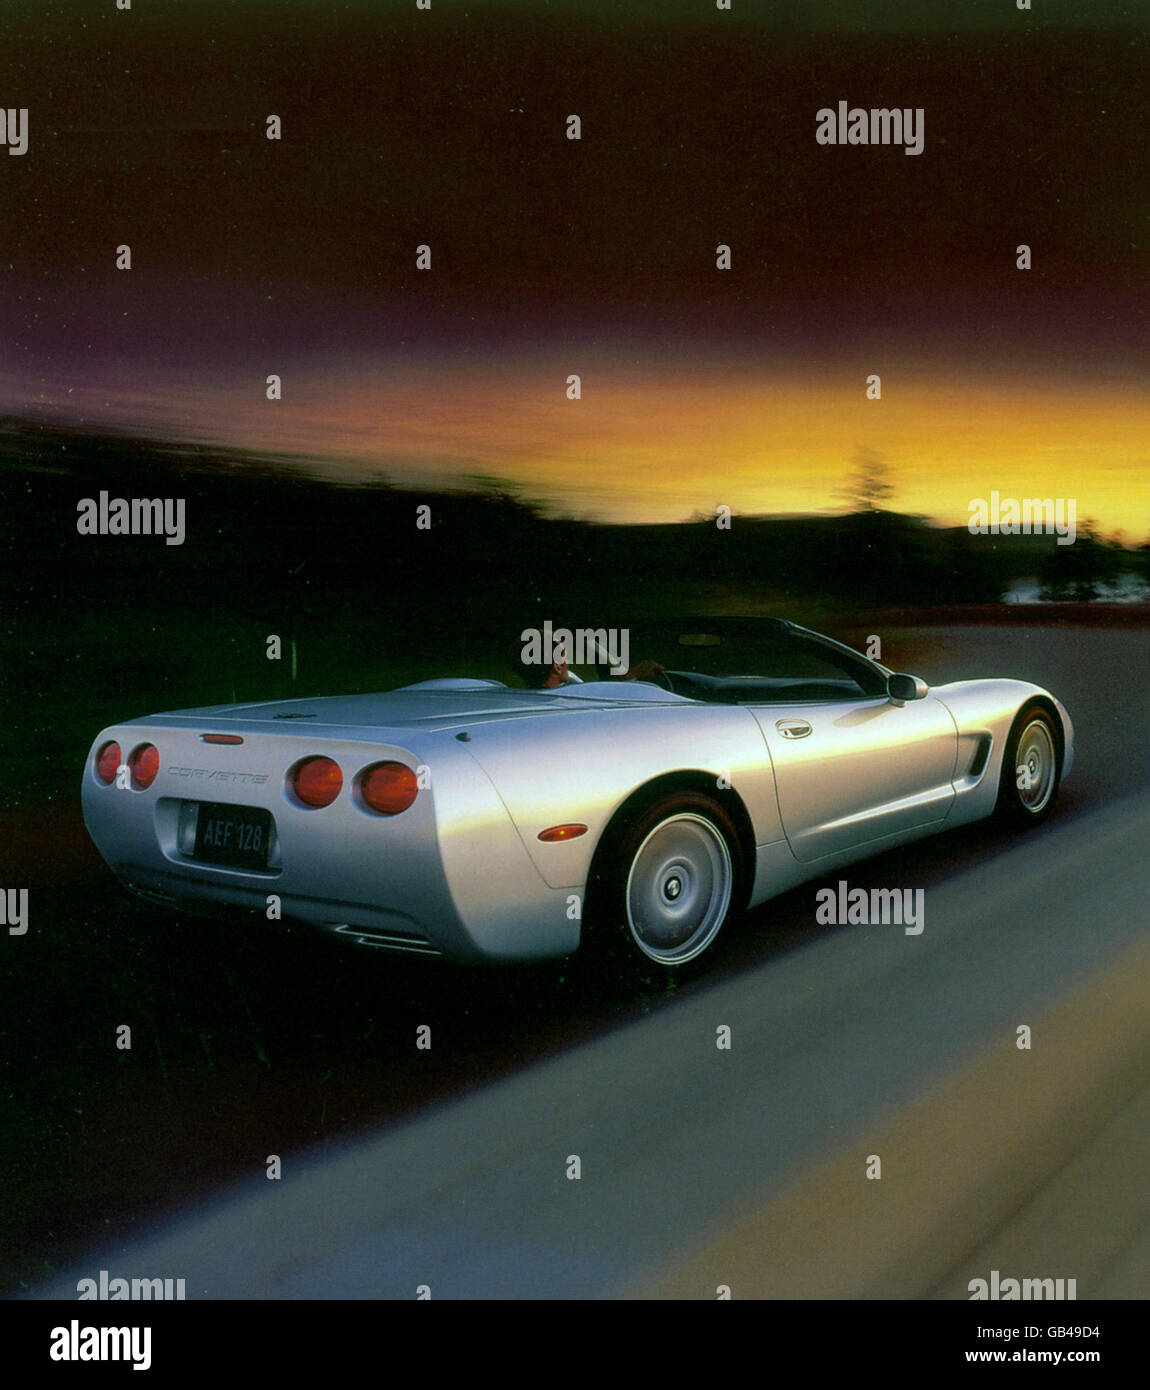 CHEVROLET CORVETTE CONVERTIBLE 1999. Photo General Motors Stock Photo